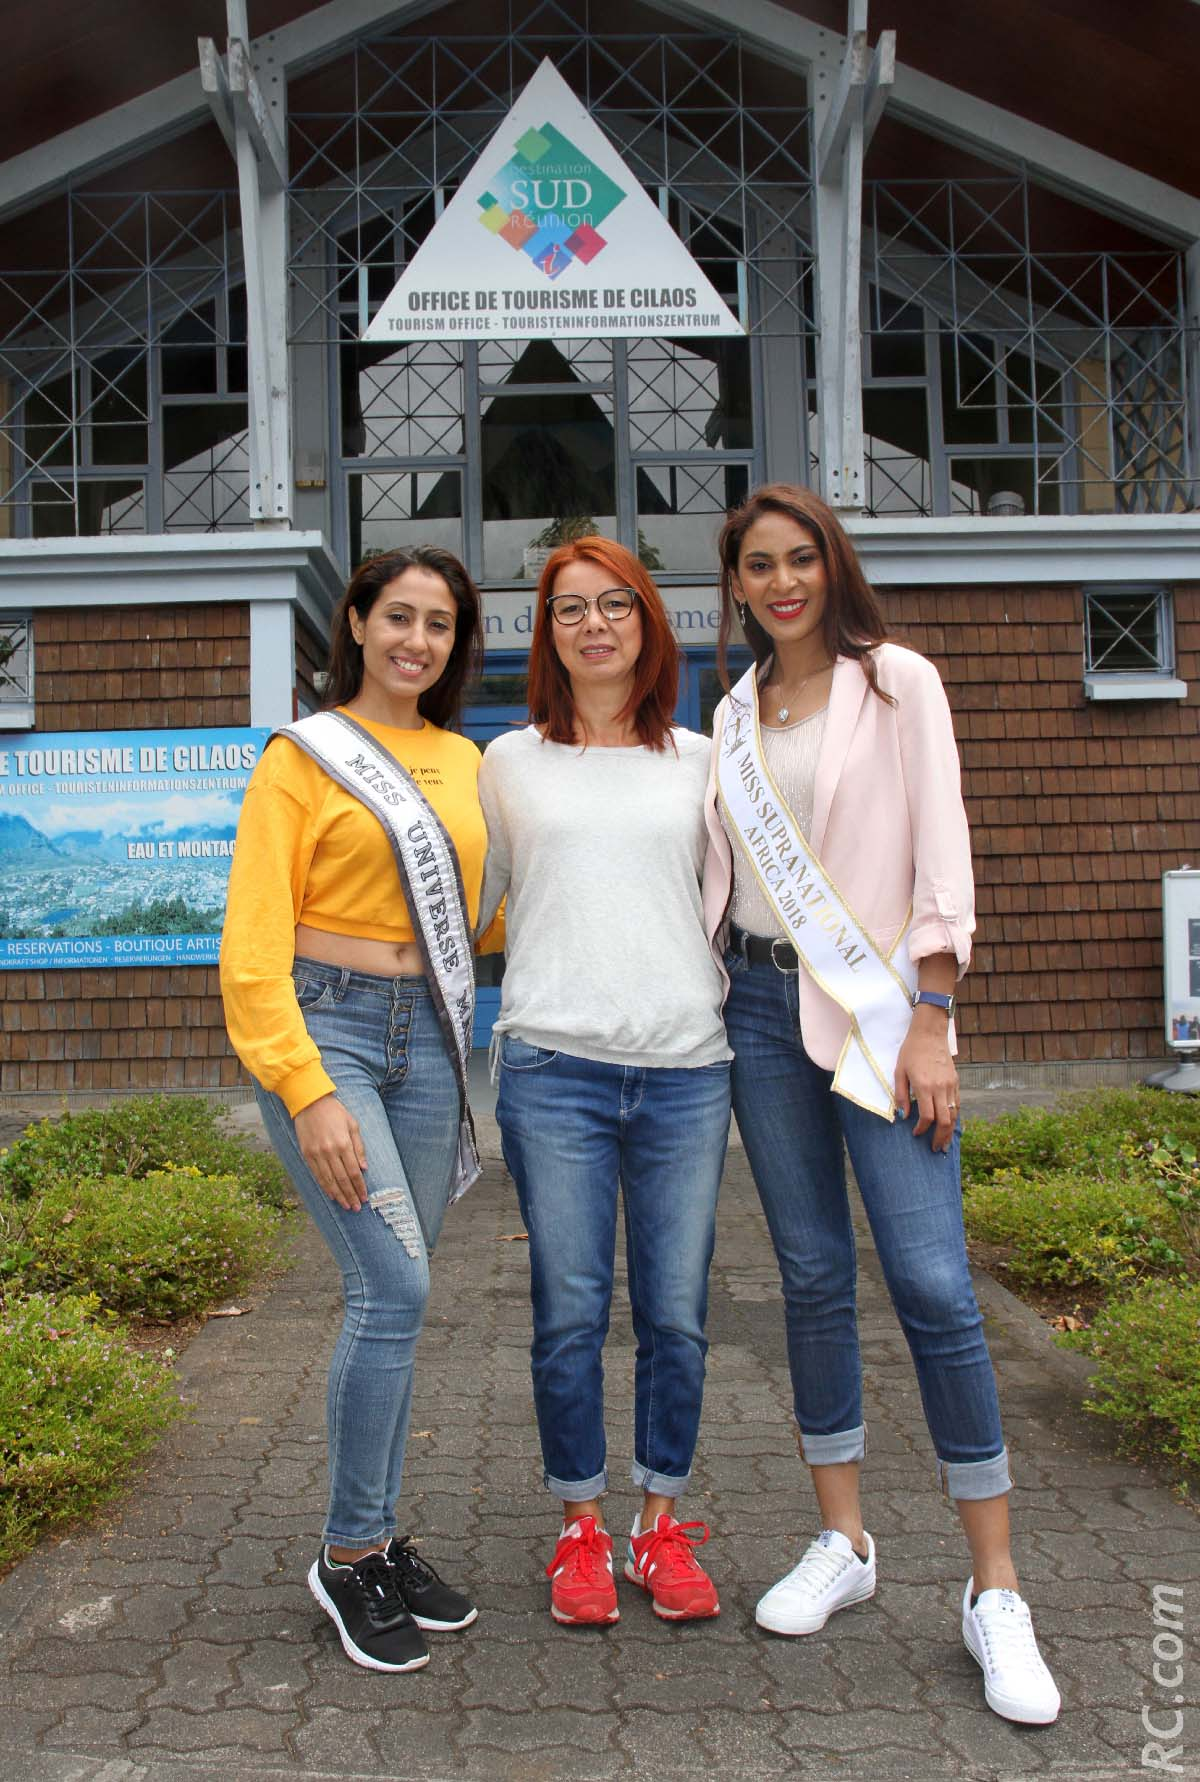 Varsha Ragoobarsing, Sandrine Aho-Nienne, adjointe au maire de Saint-Pierre, et Anoushka Ah Keng